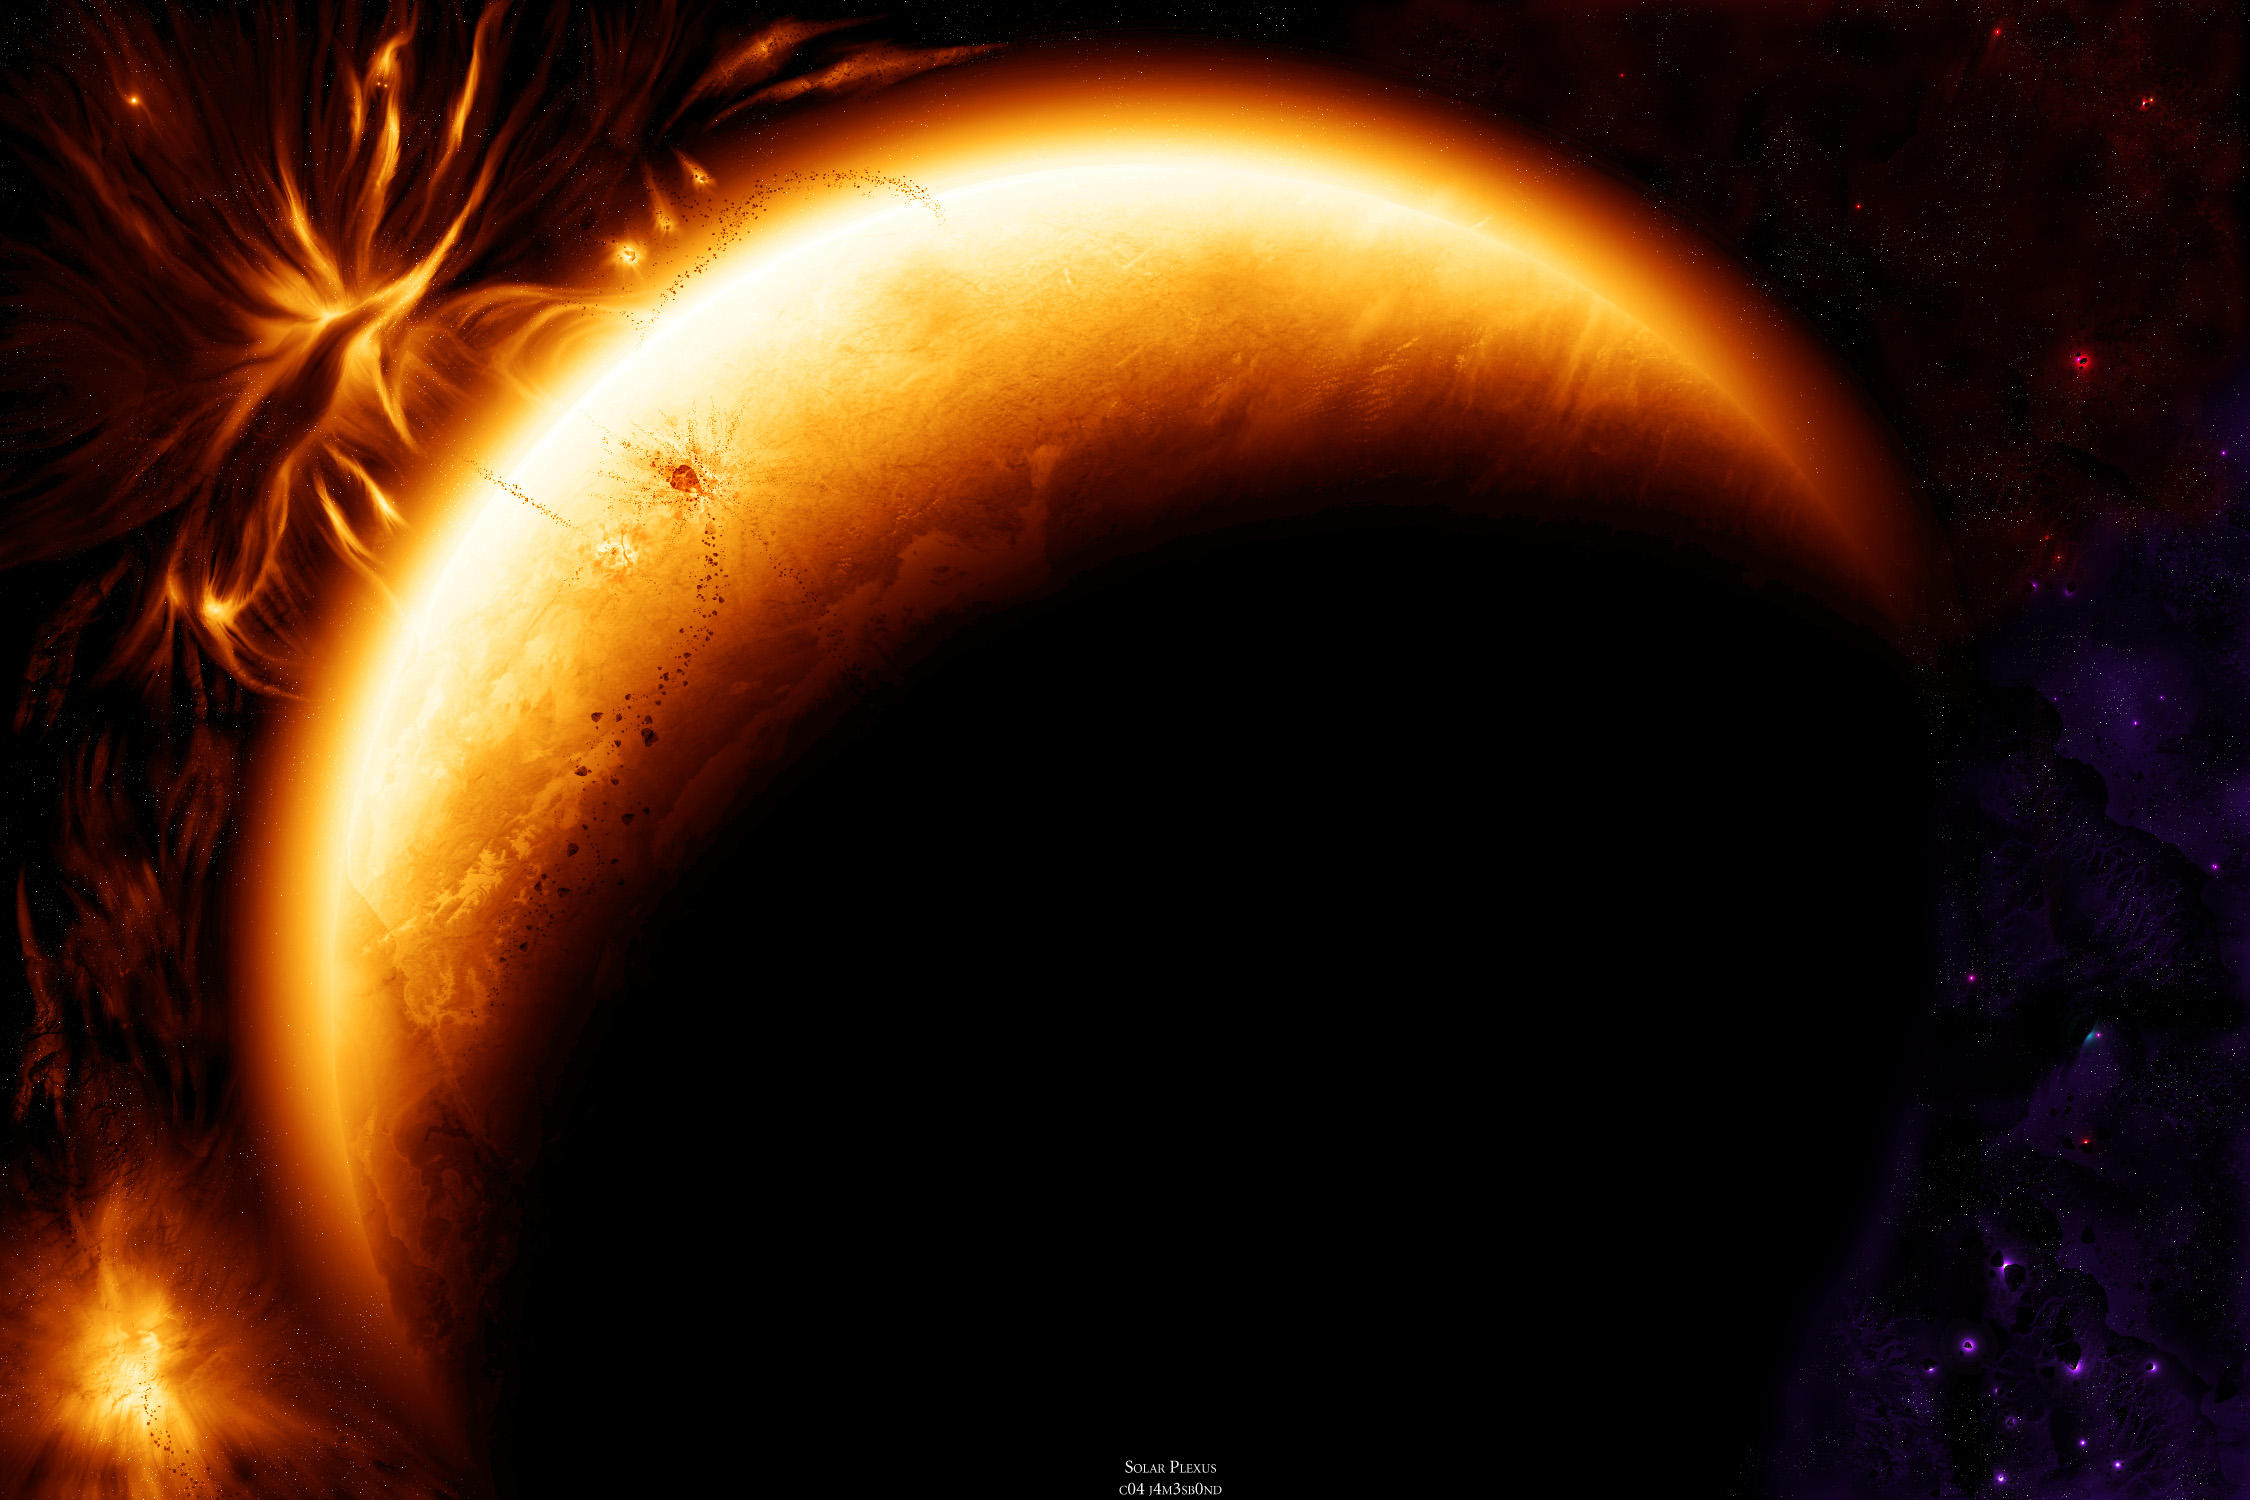 Solar Plexus by cosmicbound